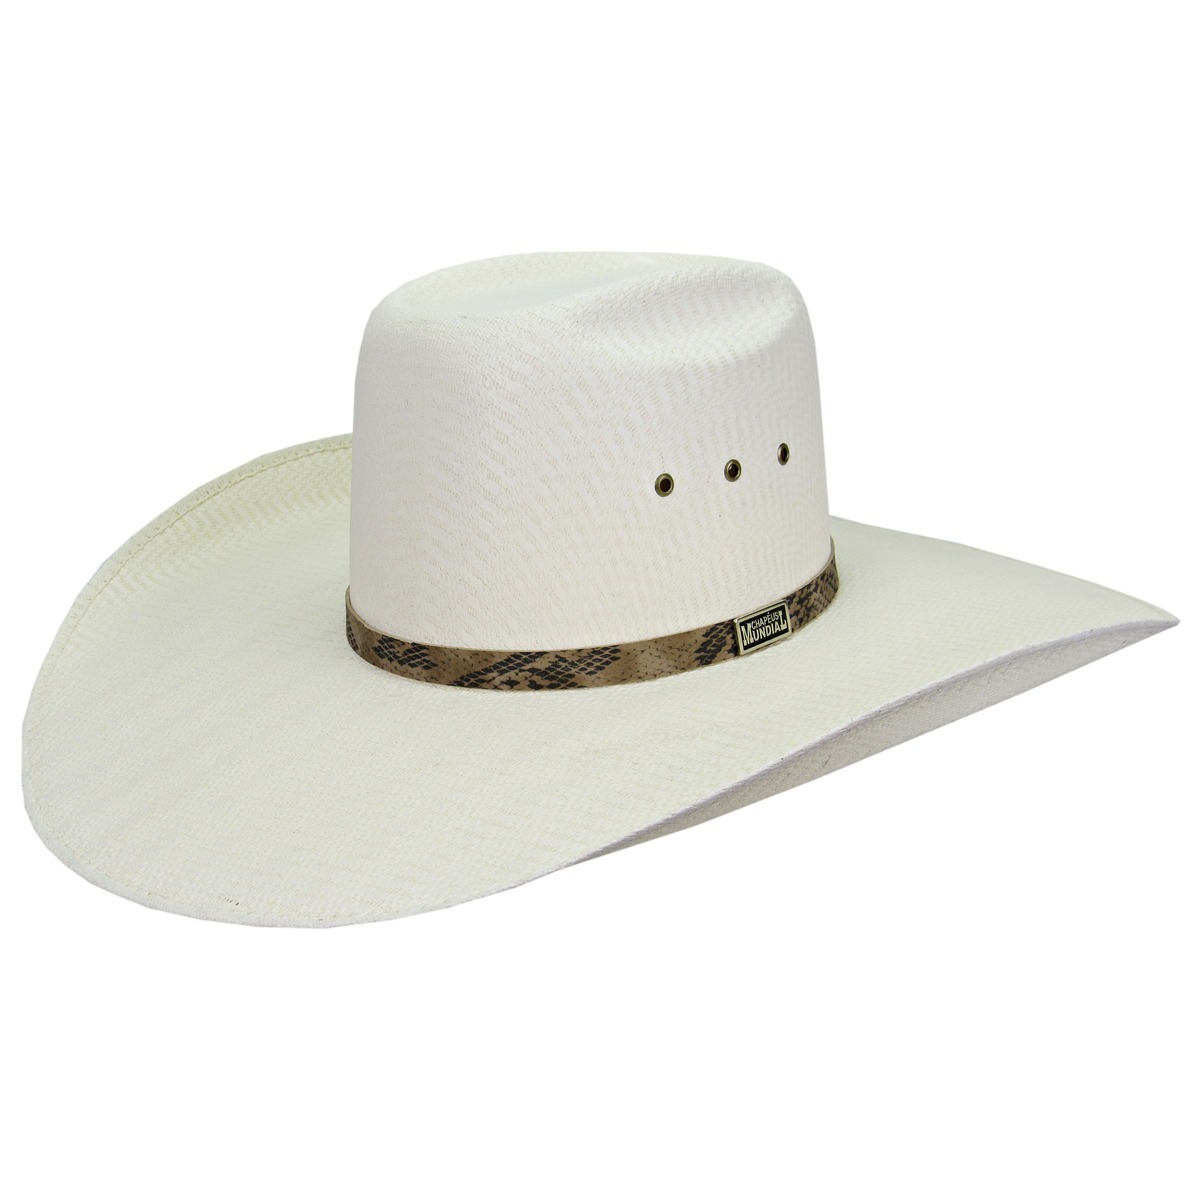 chapéu masculino country balada feminino sertanejo aba 12. Carregando zoom. 9b917c83552